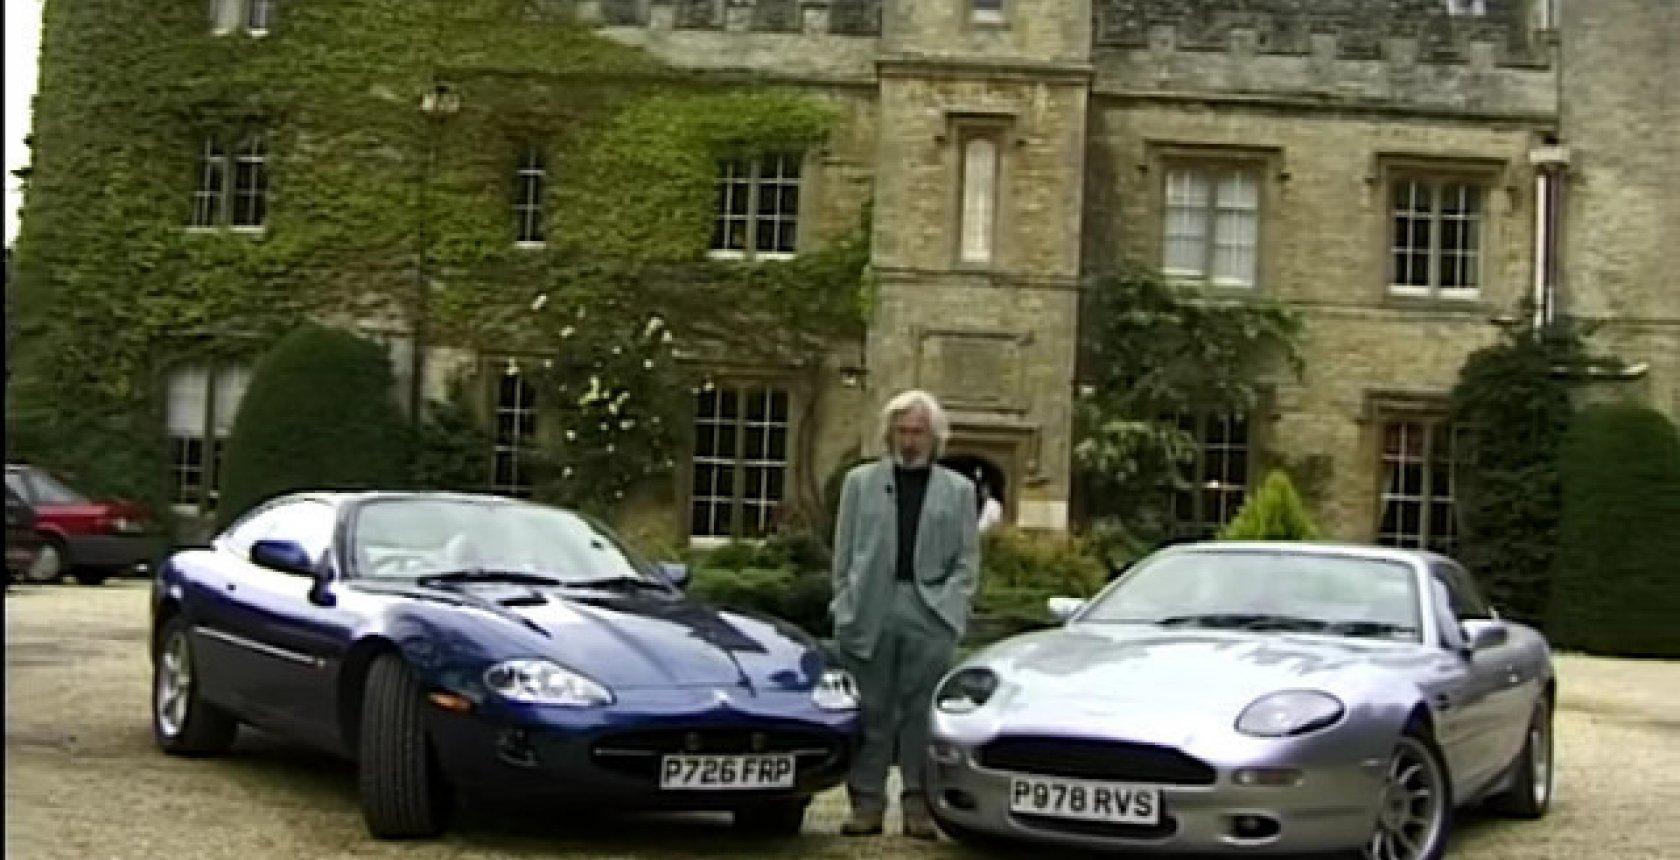 The Largest Jaguar Club Covering All Models Jaguar Enthusiasts Club